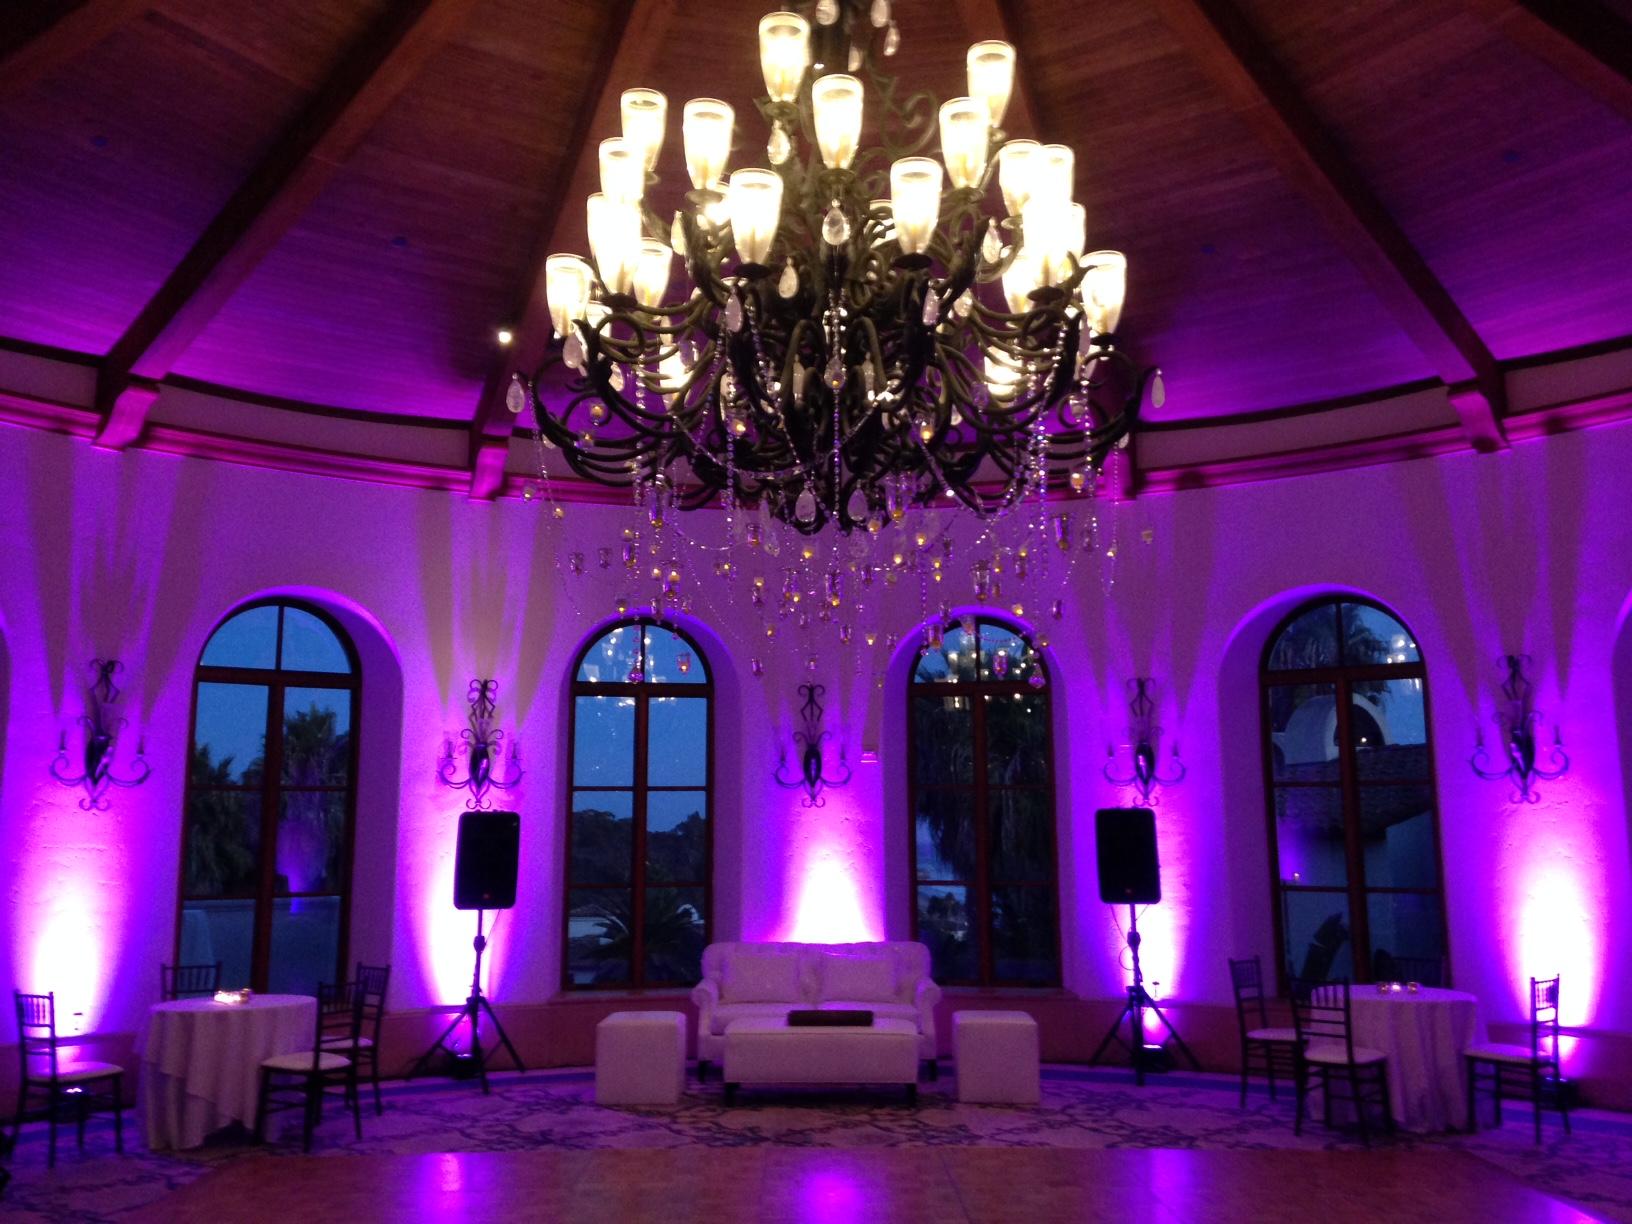 Santa Barbara Wedding DJs Event Lighting : Full lighting design house, lighting design, professional lighting